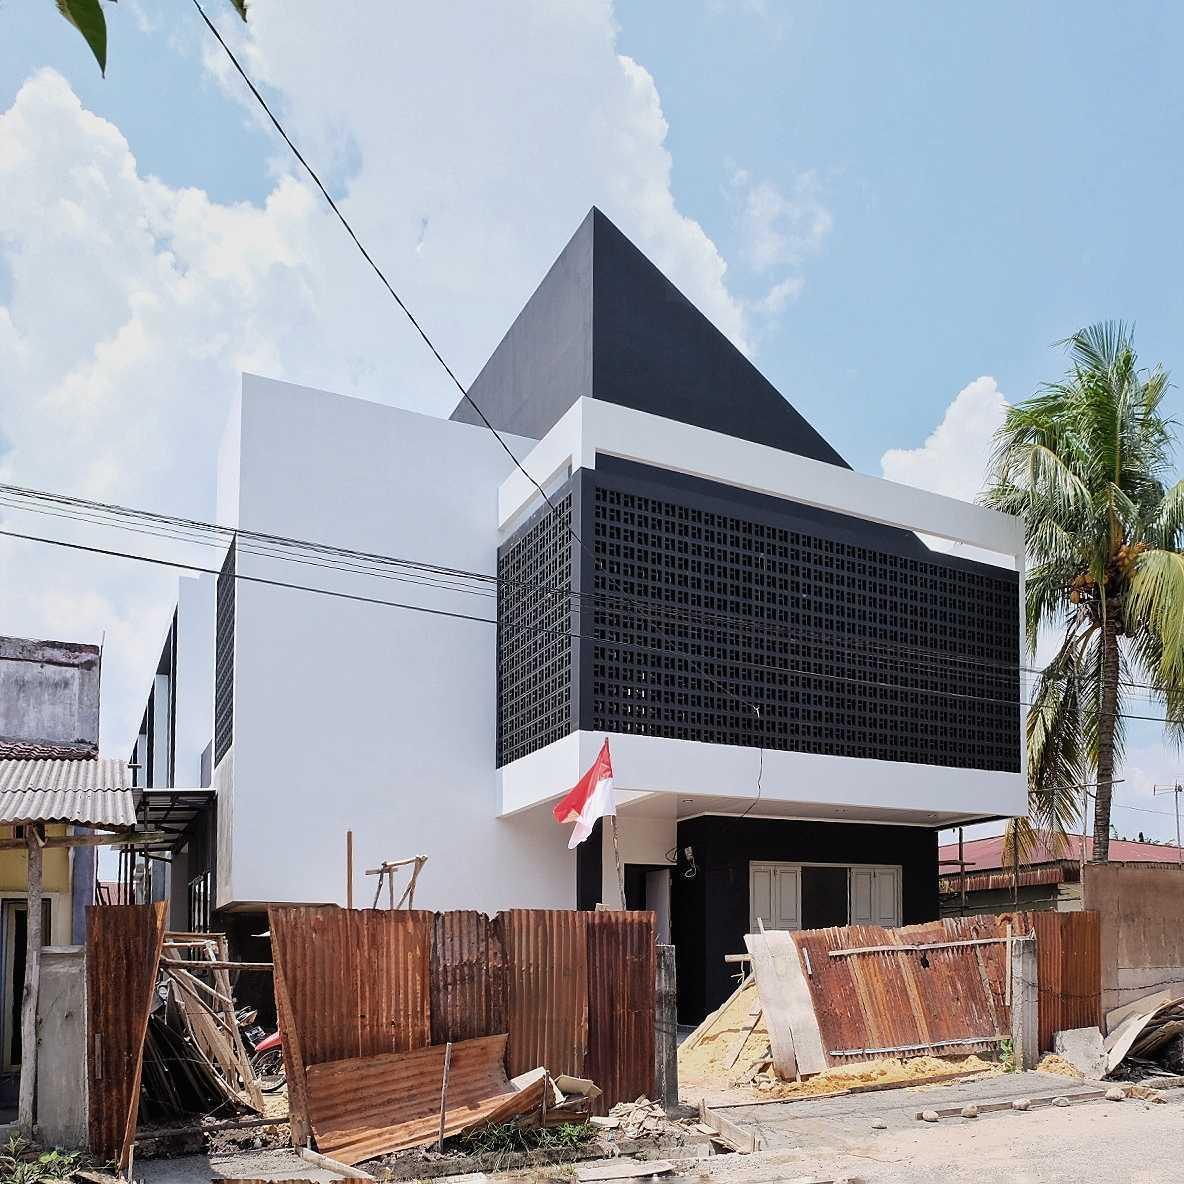 Xoa Design Ampi Boarding House Pekanbaru, Kota Pekanbaru, Riau, Indonesia Pekanbaru, Kota Pekanbaru, Riau, Indonesia Front View Contemporary,kontemporer 39313